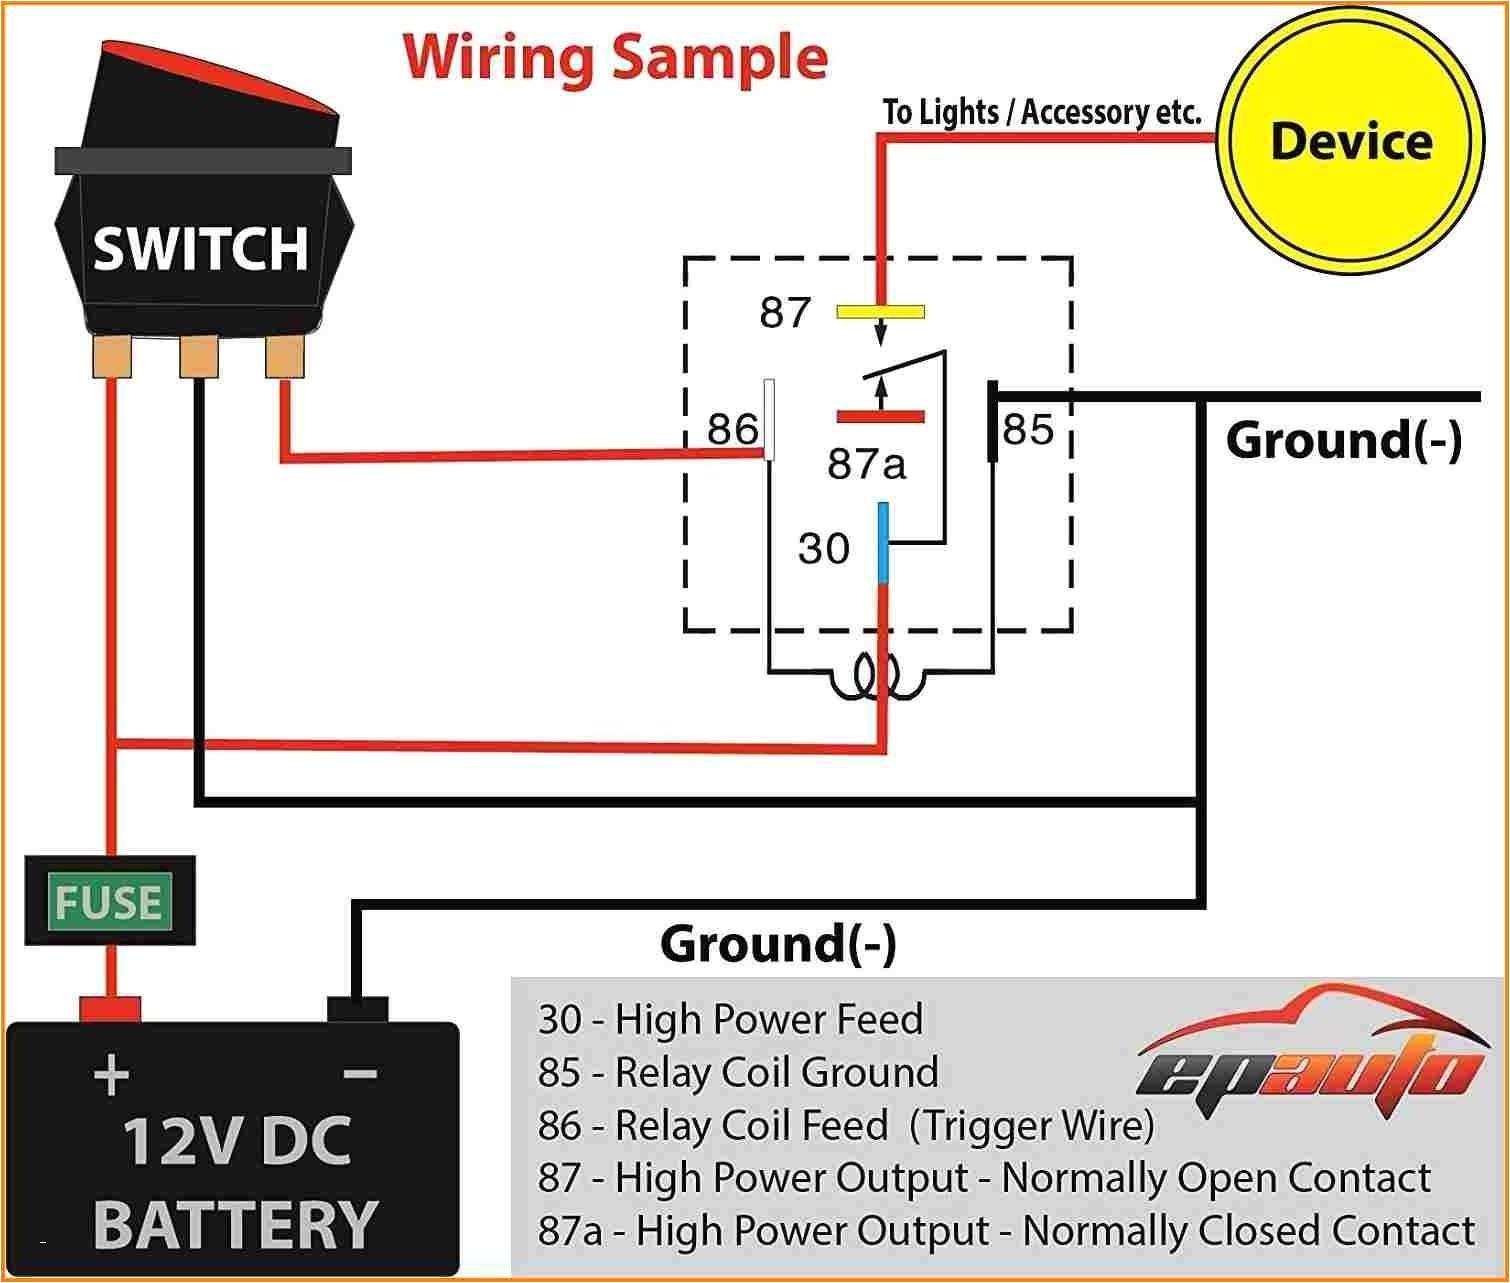 wiring diagram honeywell dpdt wiring diagram query wiring diagram honeywell dpdt